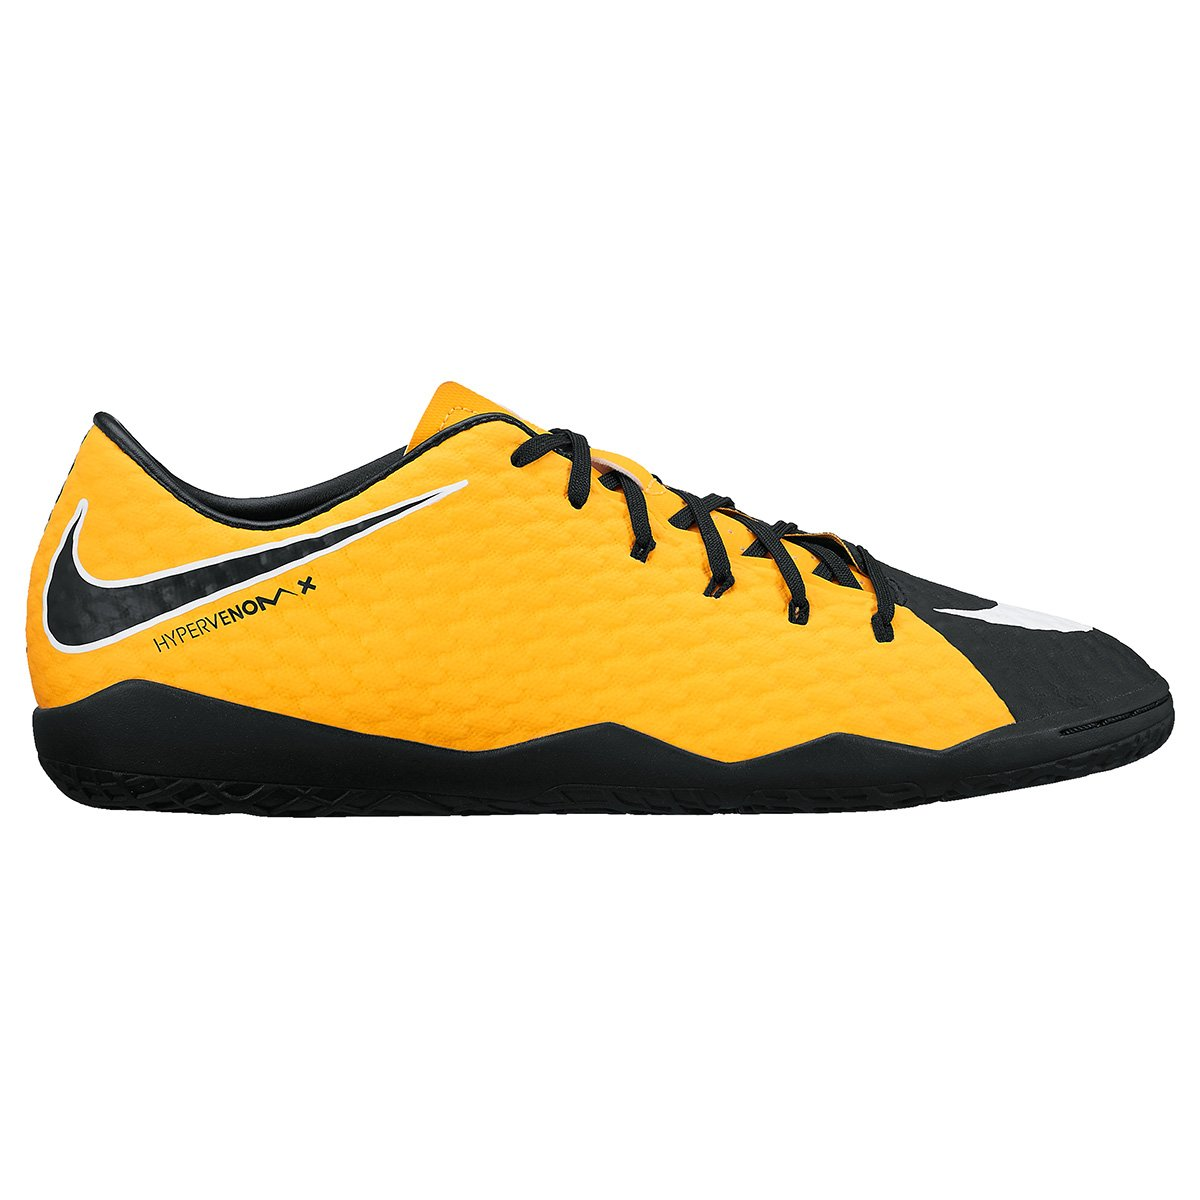 Chuteira Futsal Nike Hypervenom Phelon 3 IC - Compre Agora  7da4d621056e8